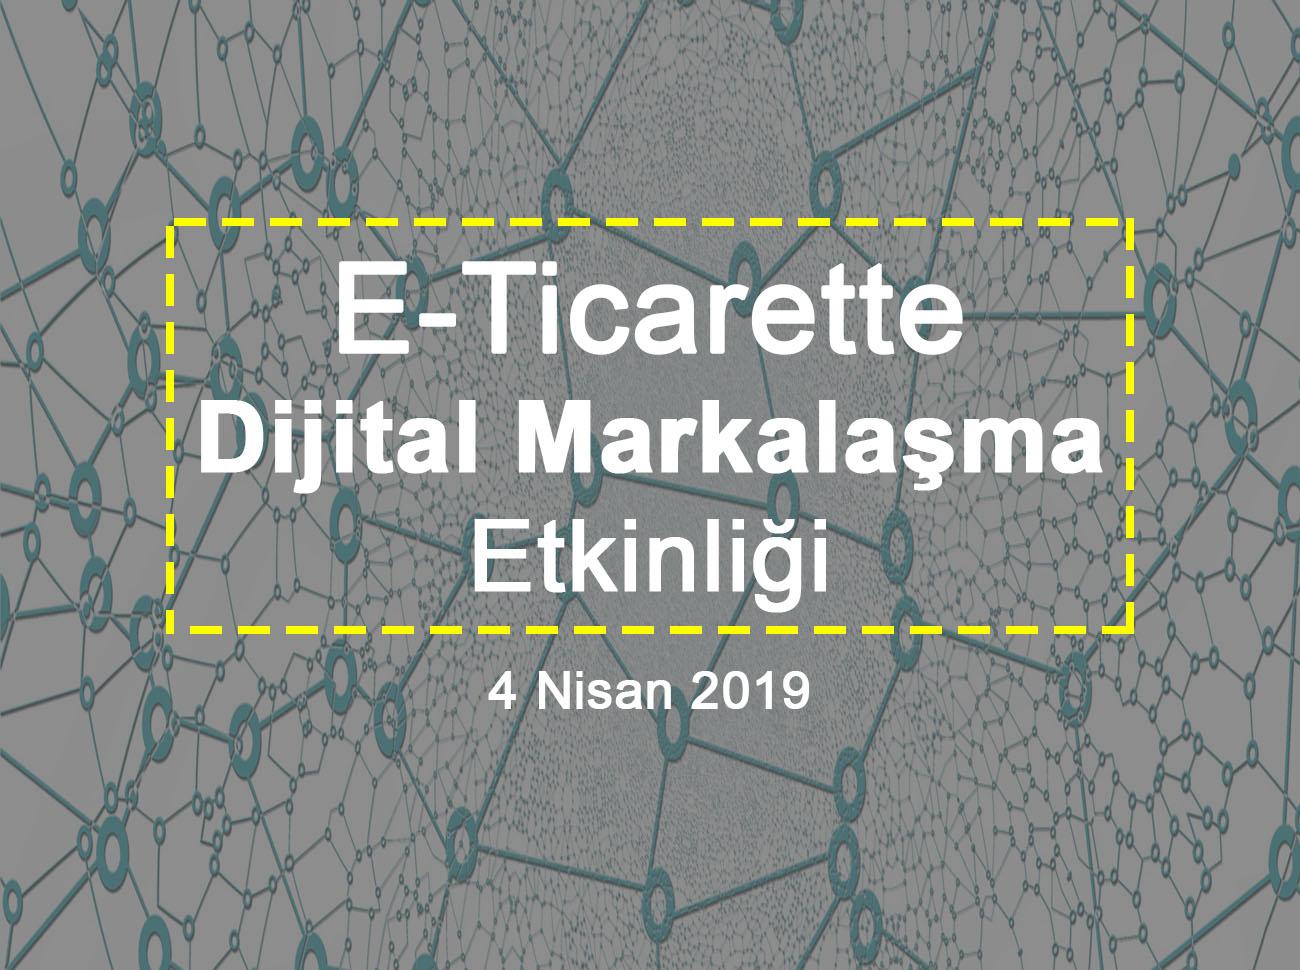 e-ticarette-dijital-markalasma-etkinligi